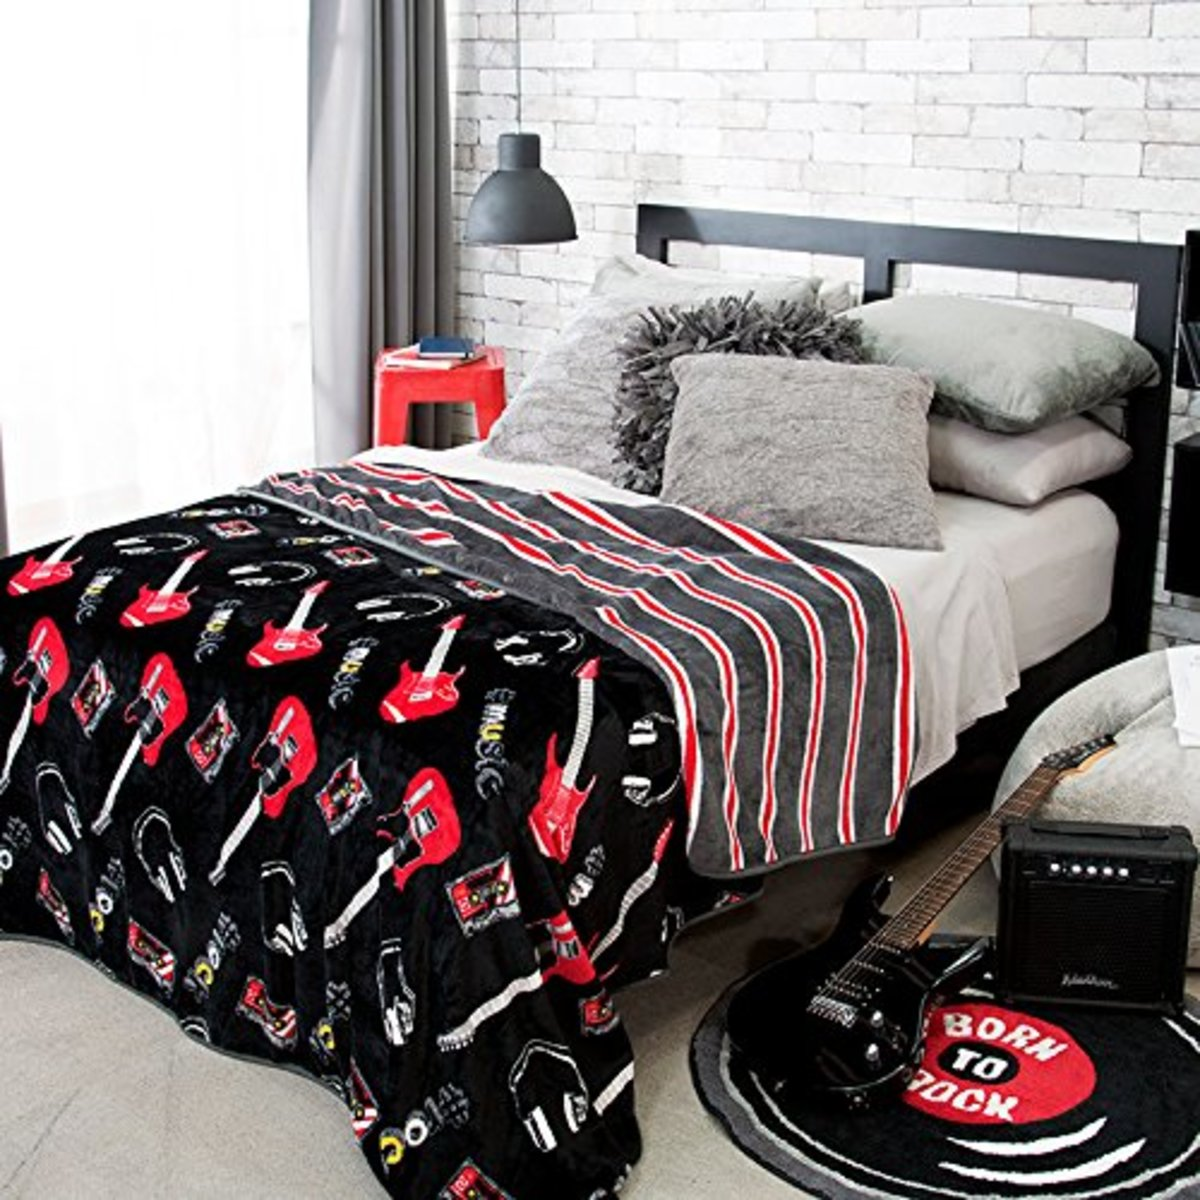 Rock 'n' Roll Bedroom Décor Ideas | HubPages